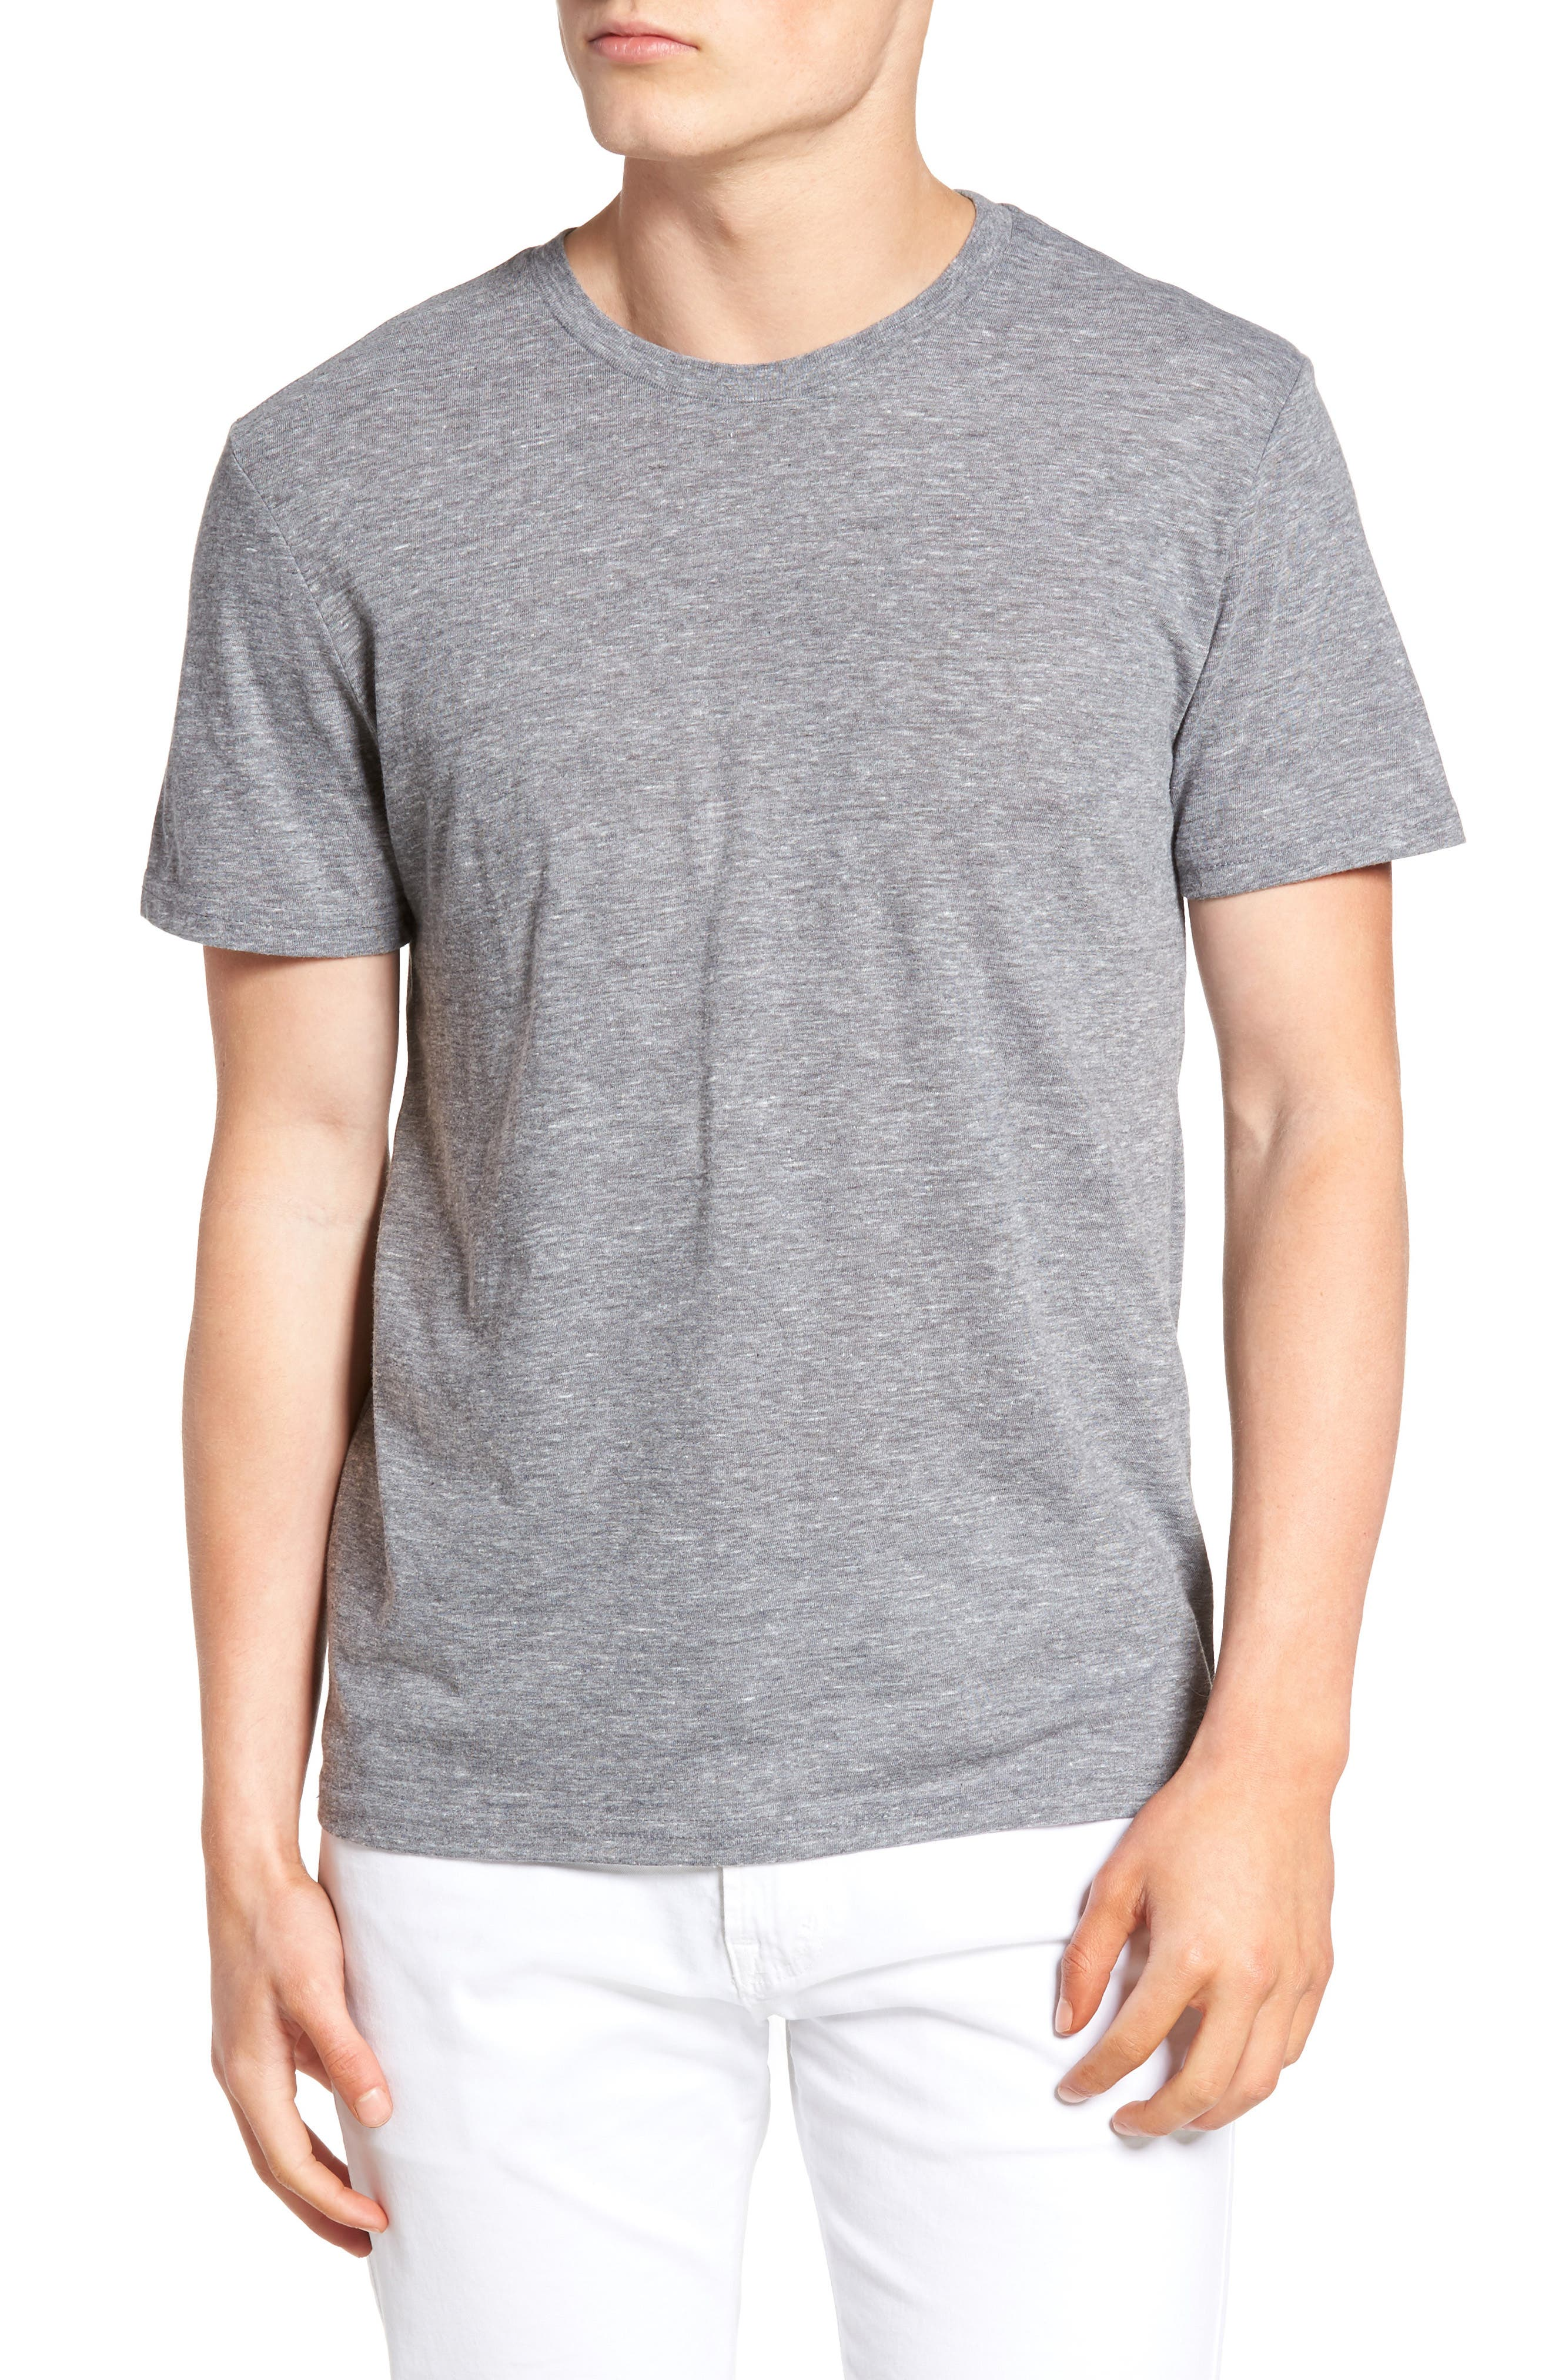 Alternate Image 1 Selected - The Rail Slim Fit Crewneck T-Shirt